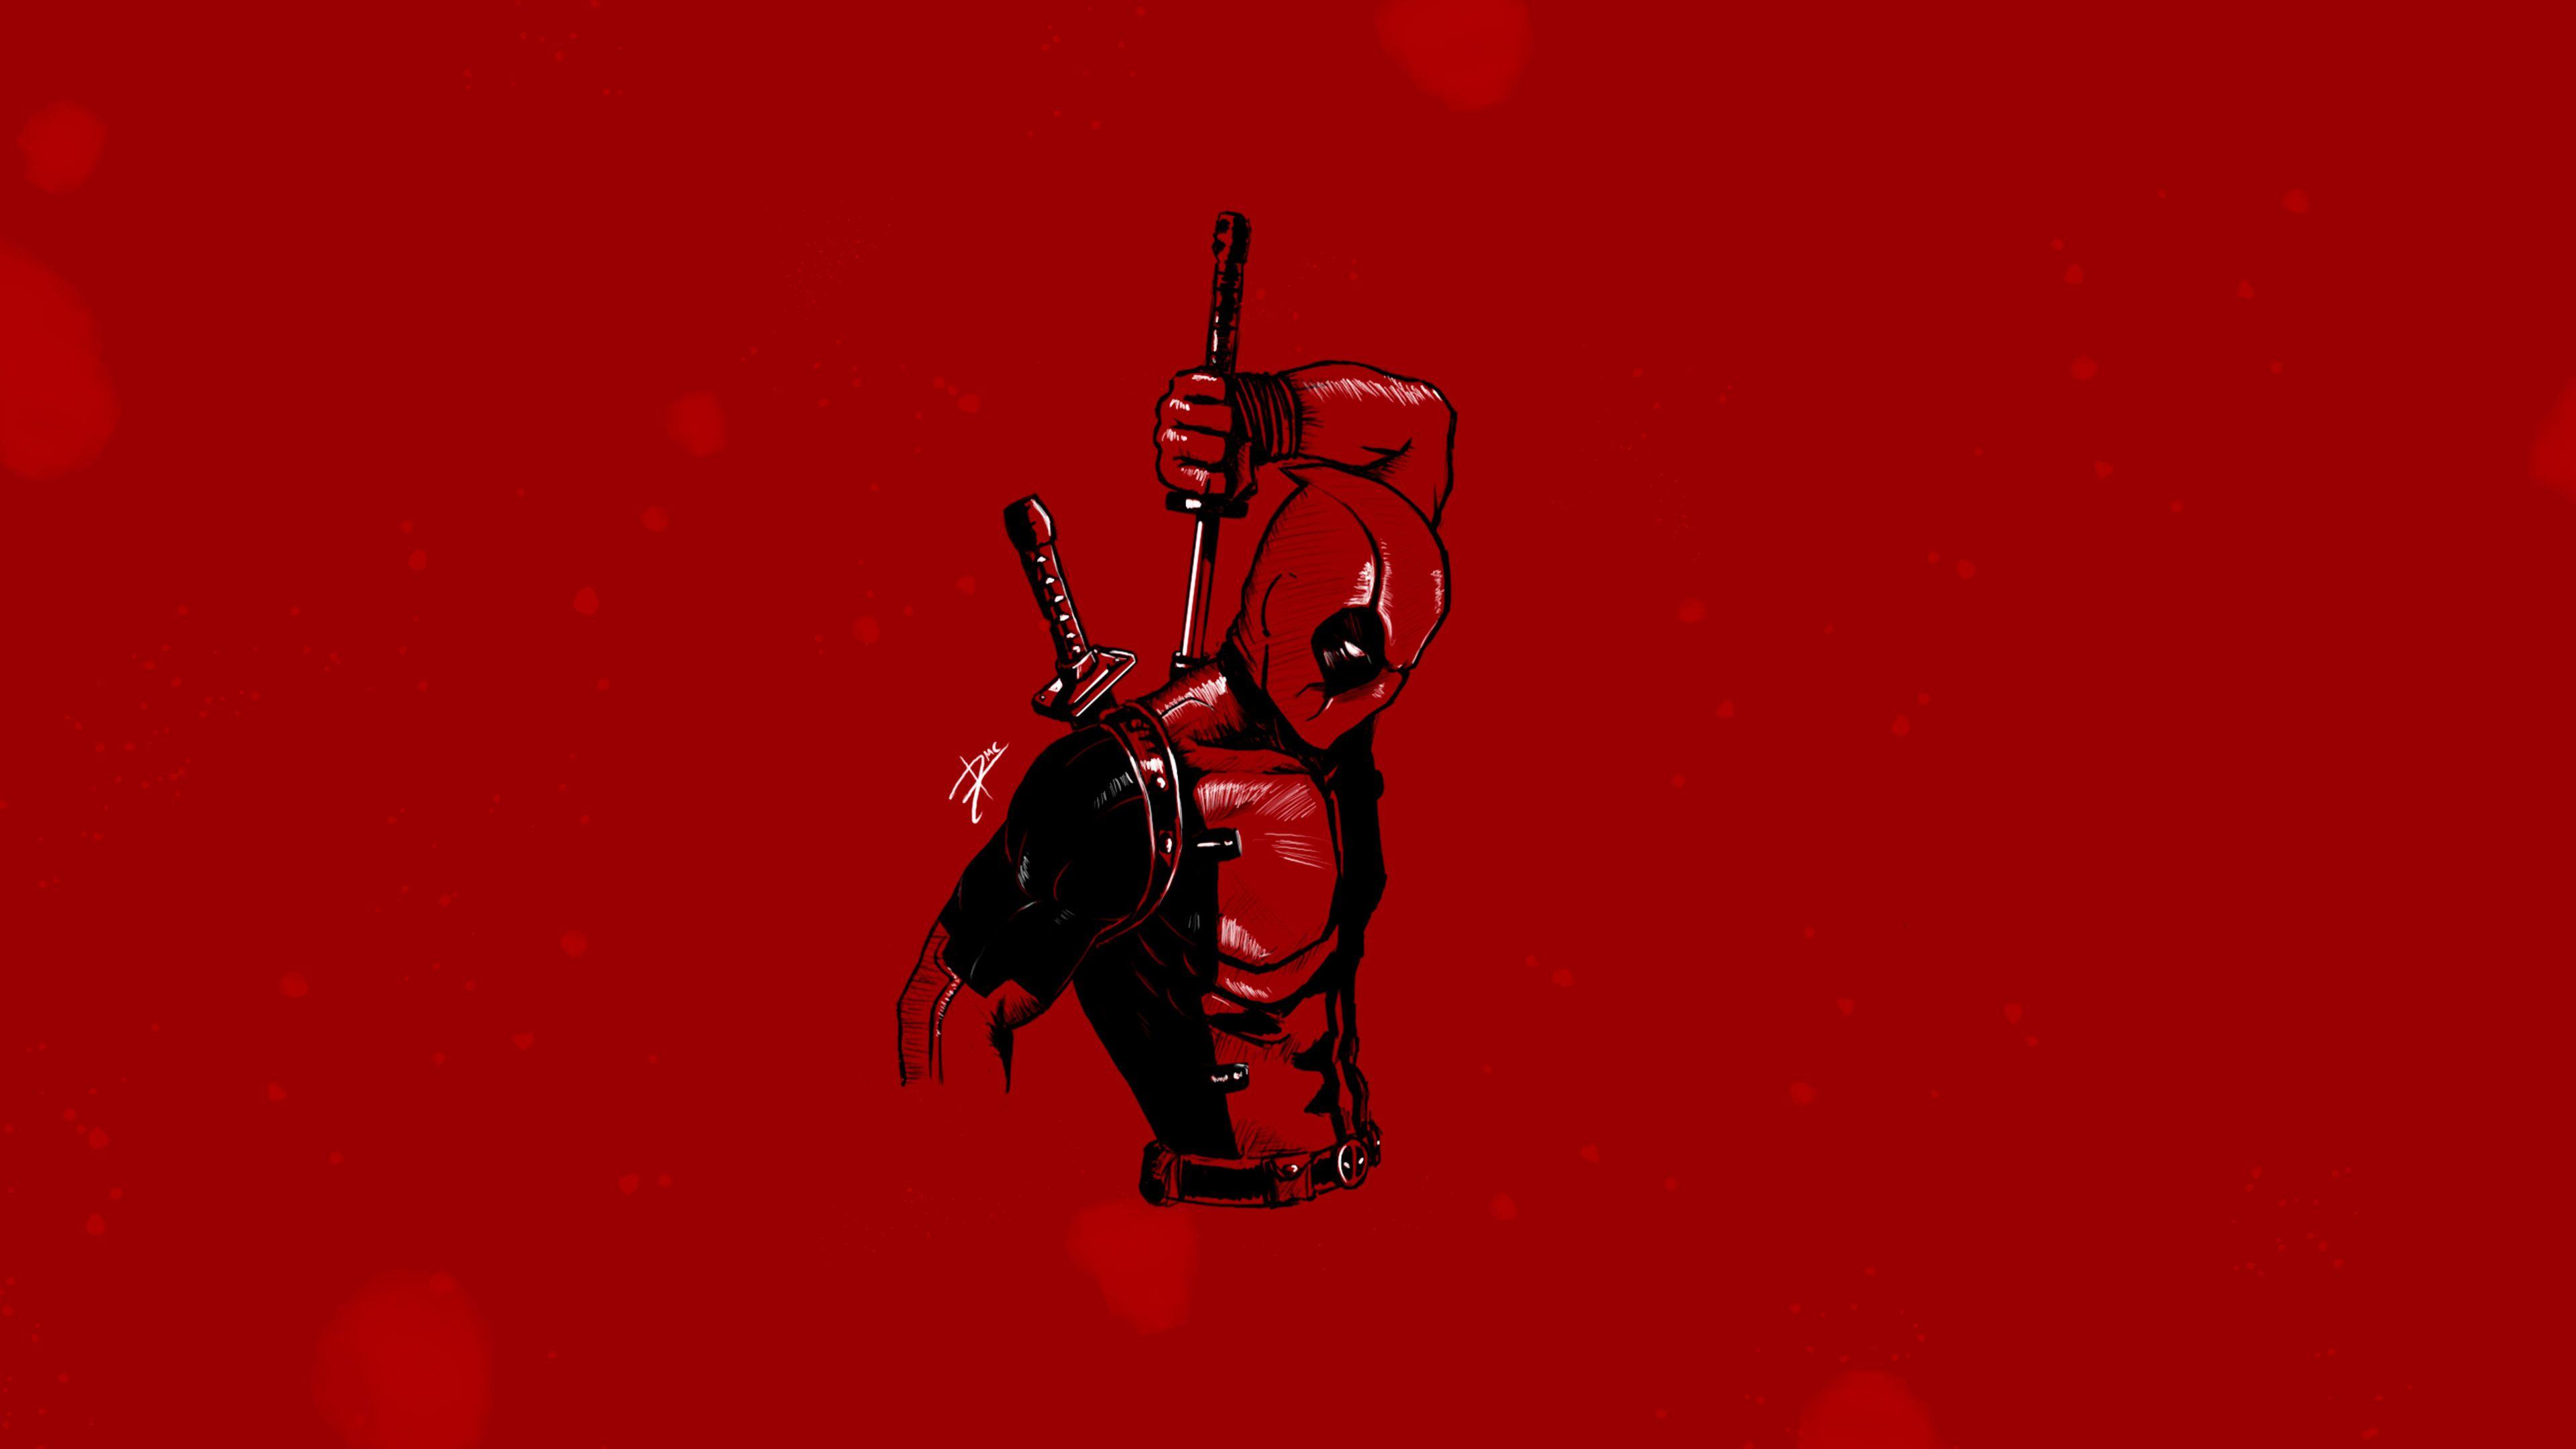 Deadpool Minimalist 4k Minimalist Wallpapers Minimalism